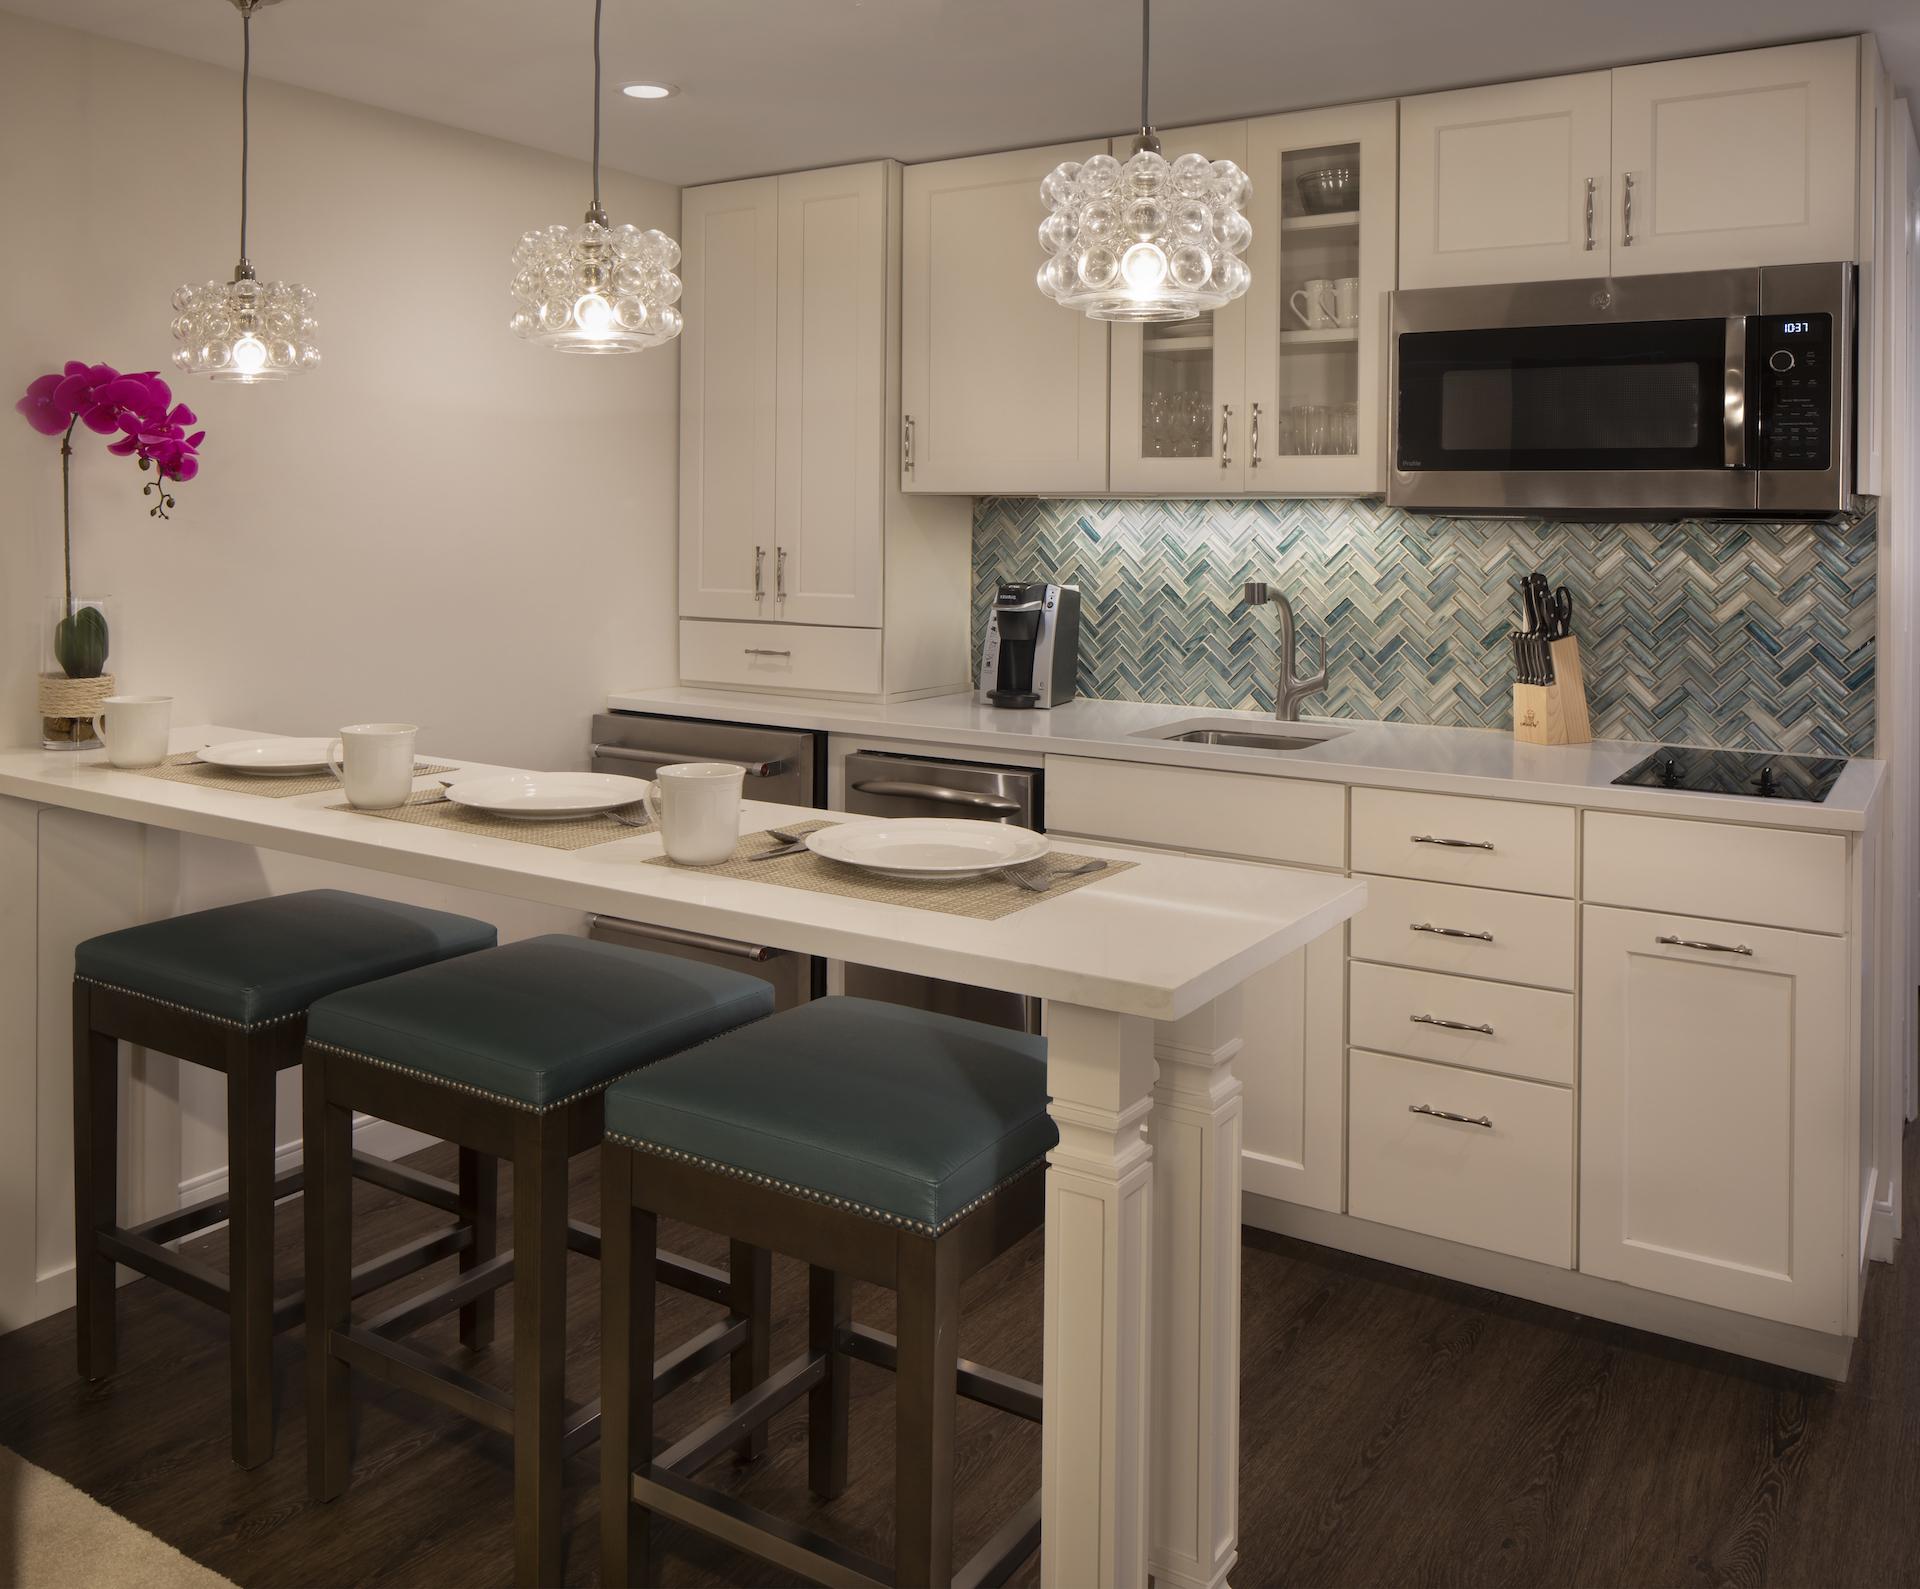 The Laureate Key West kitchen